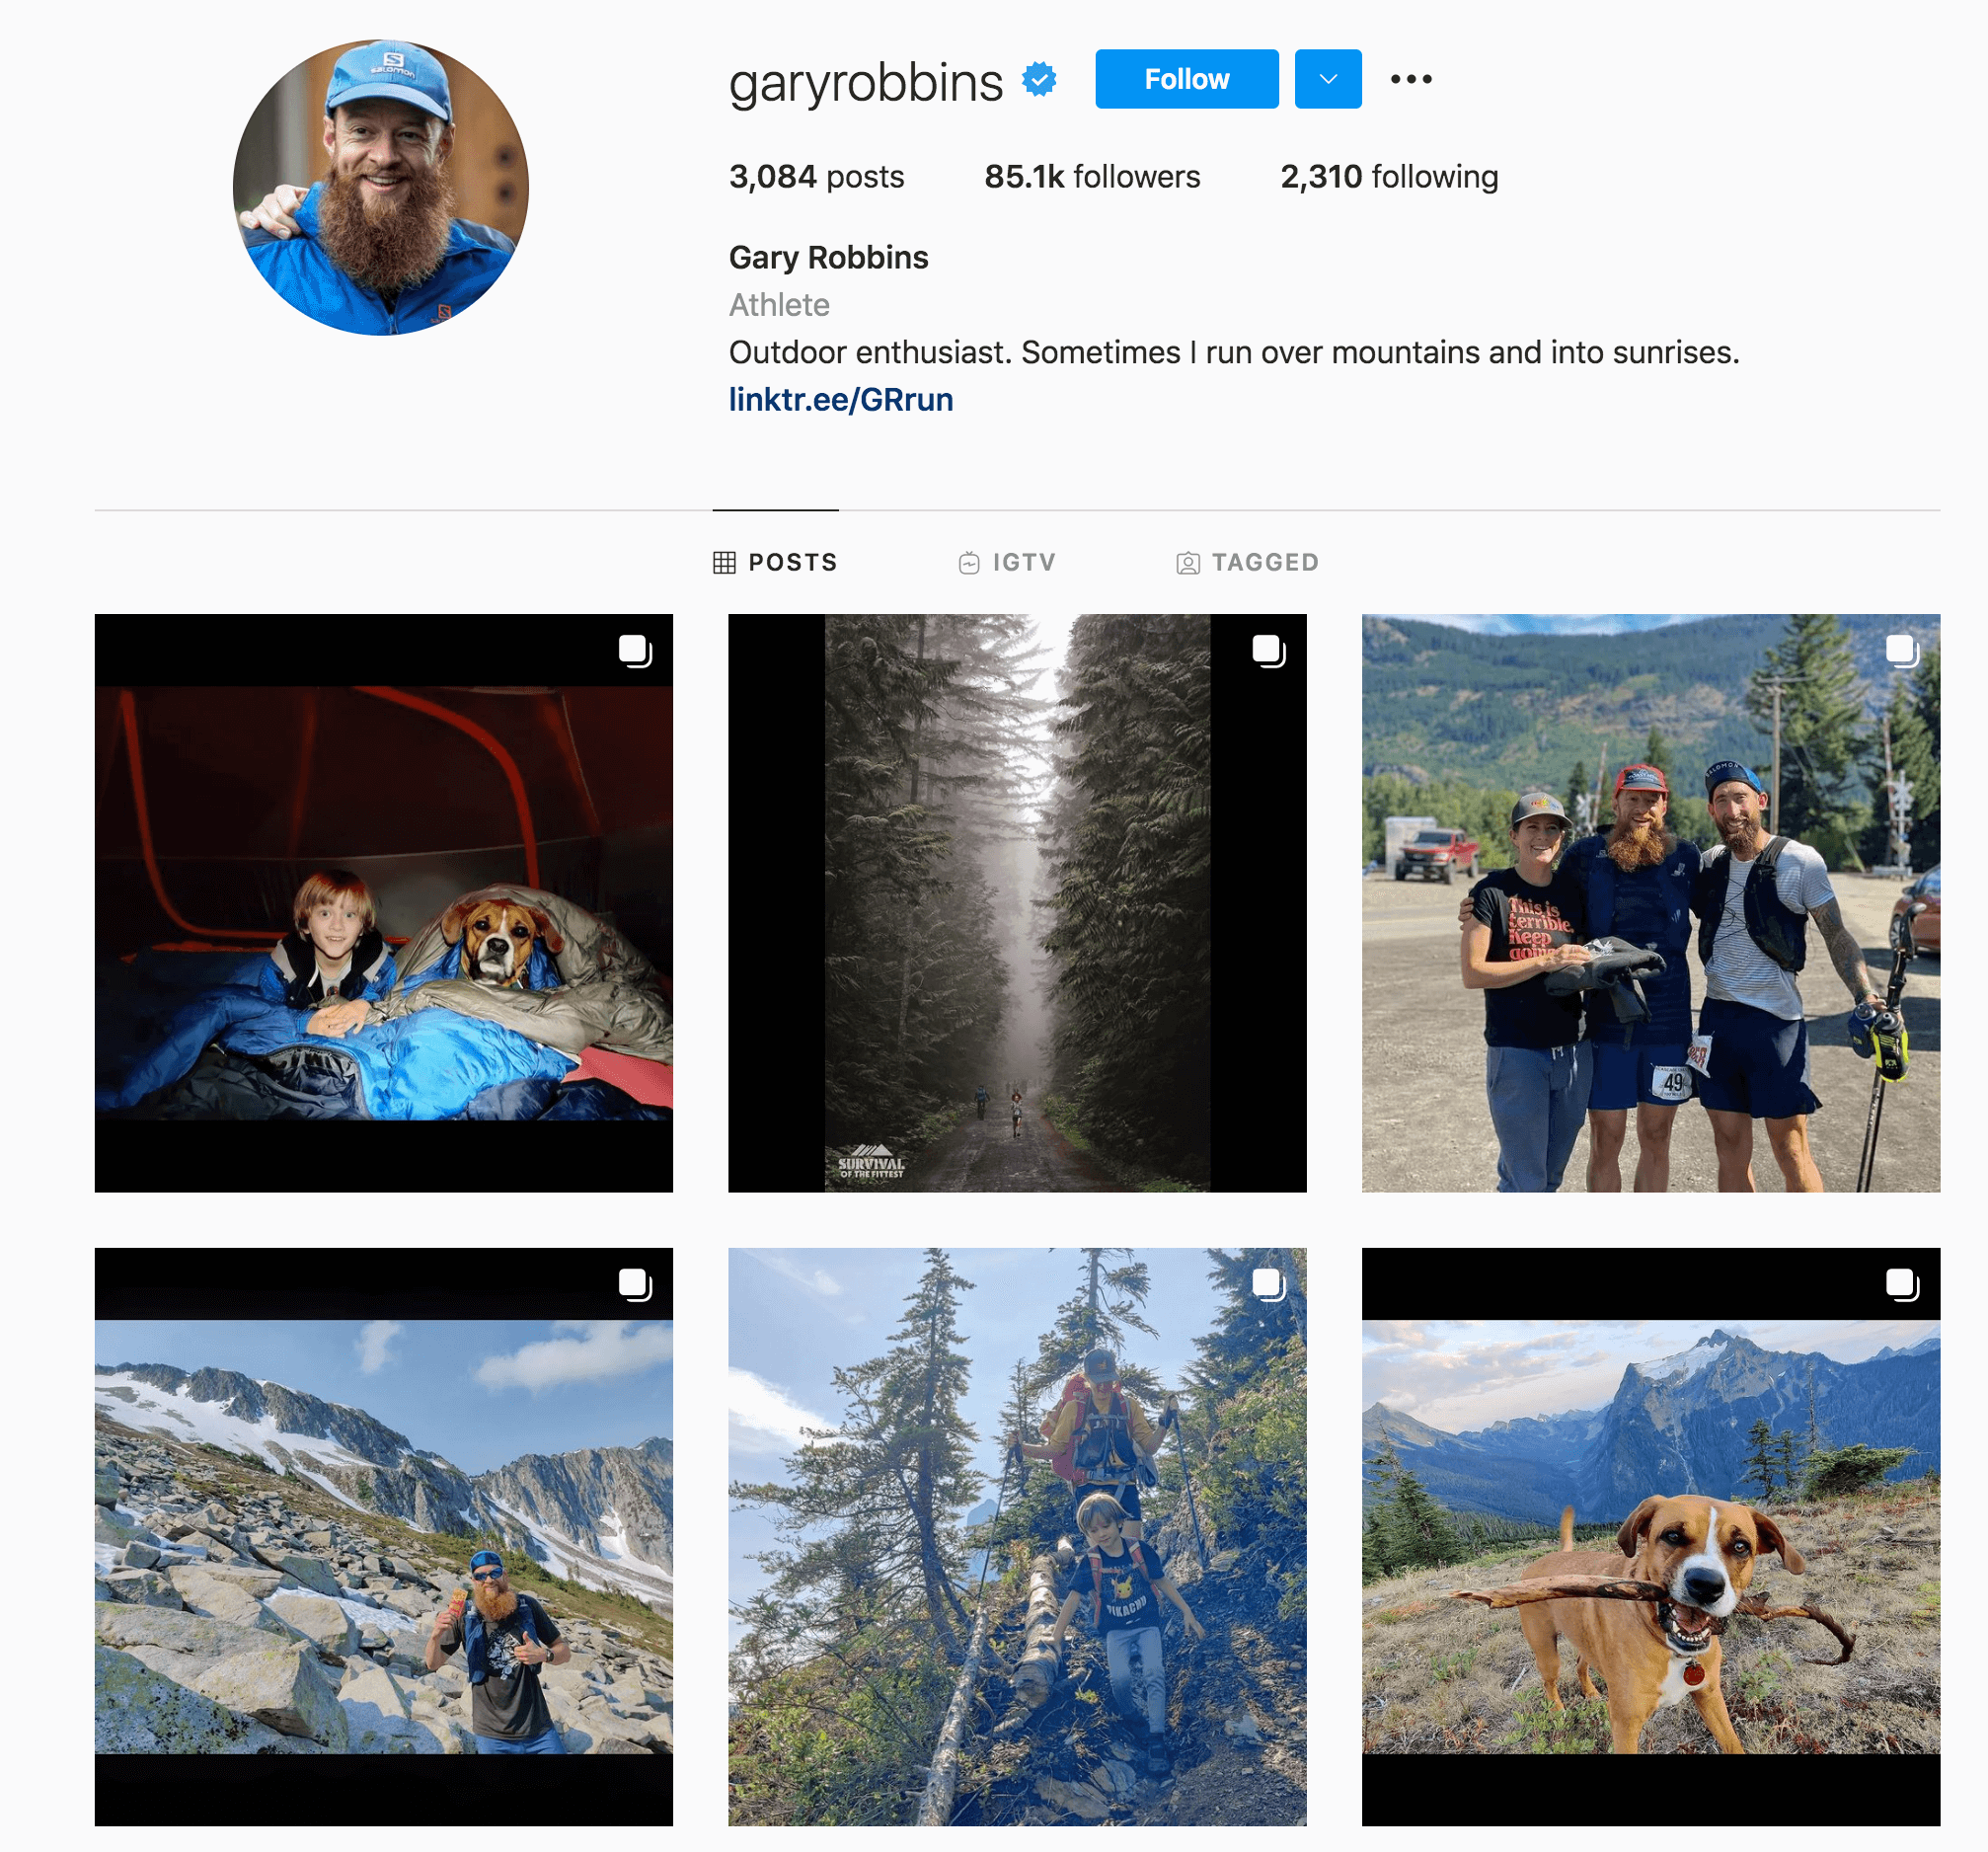 Gary Robbins Instagram Profile